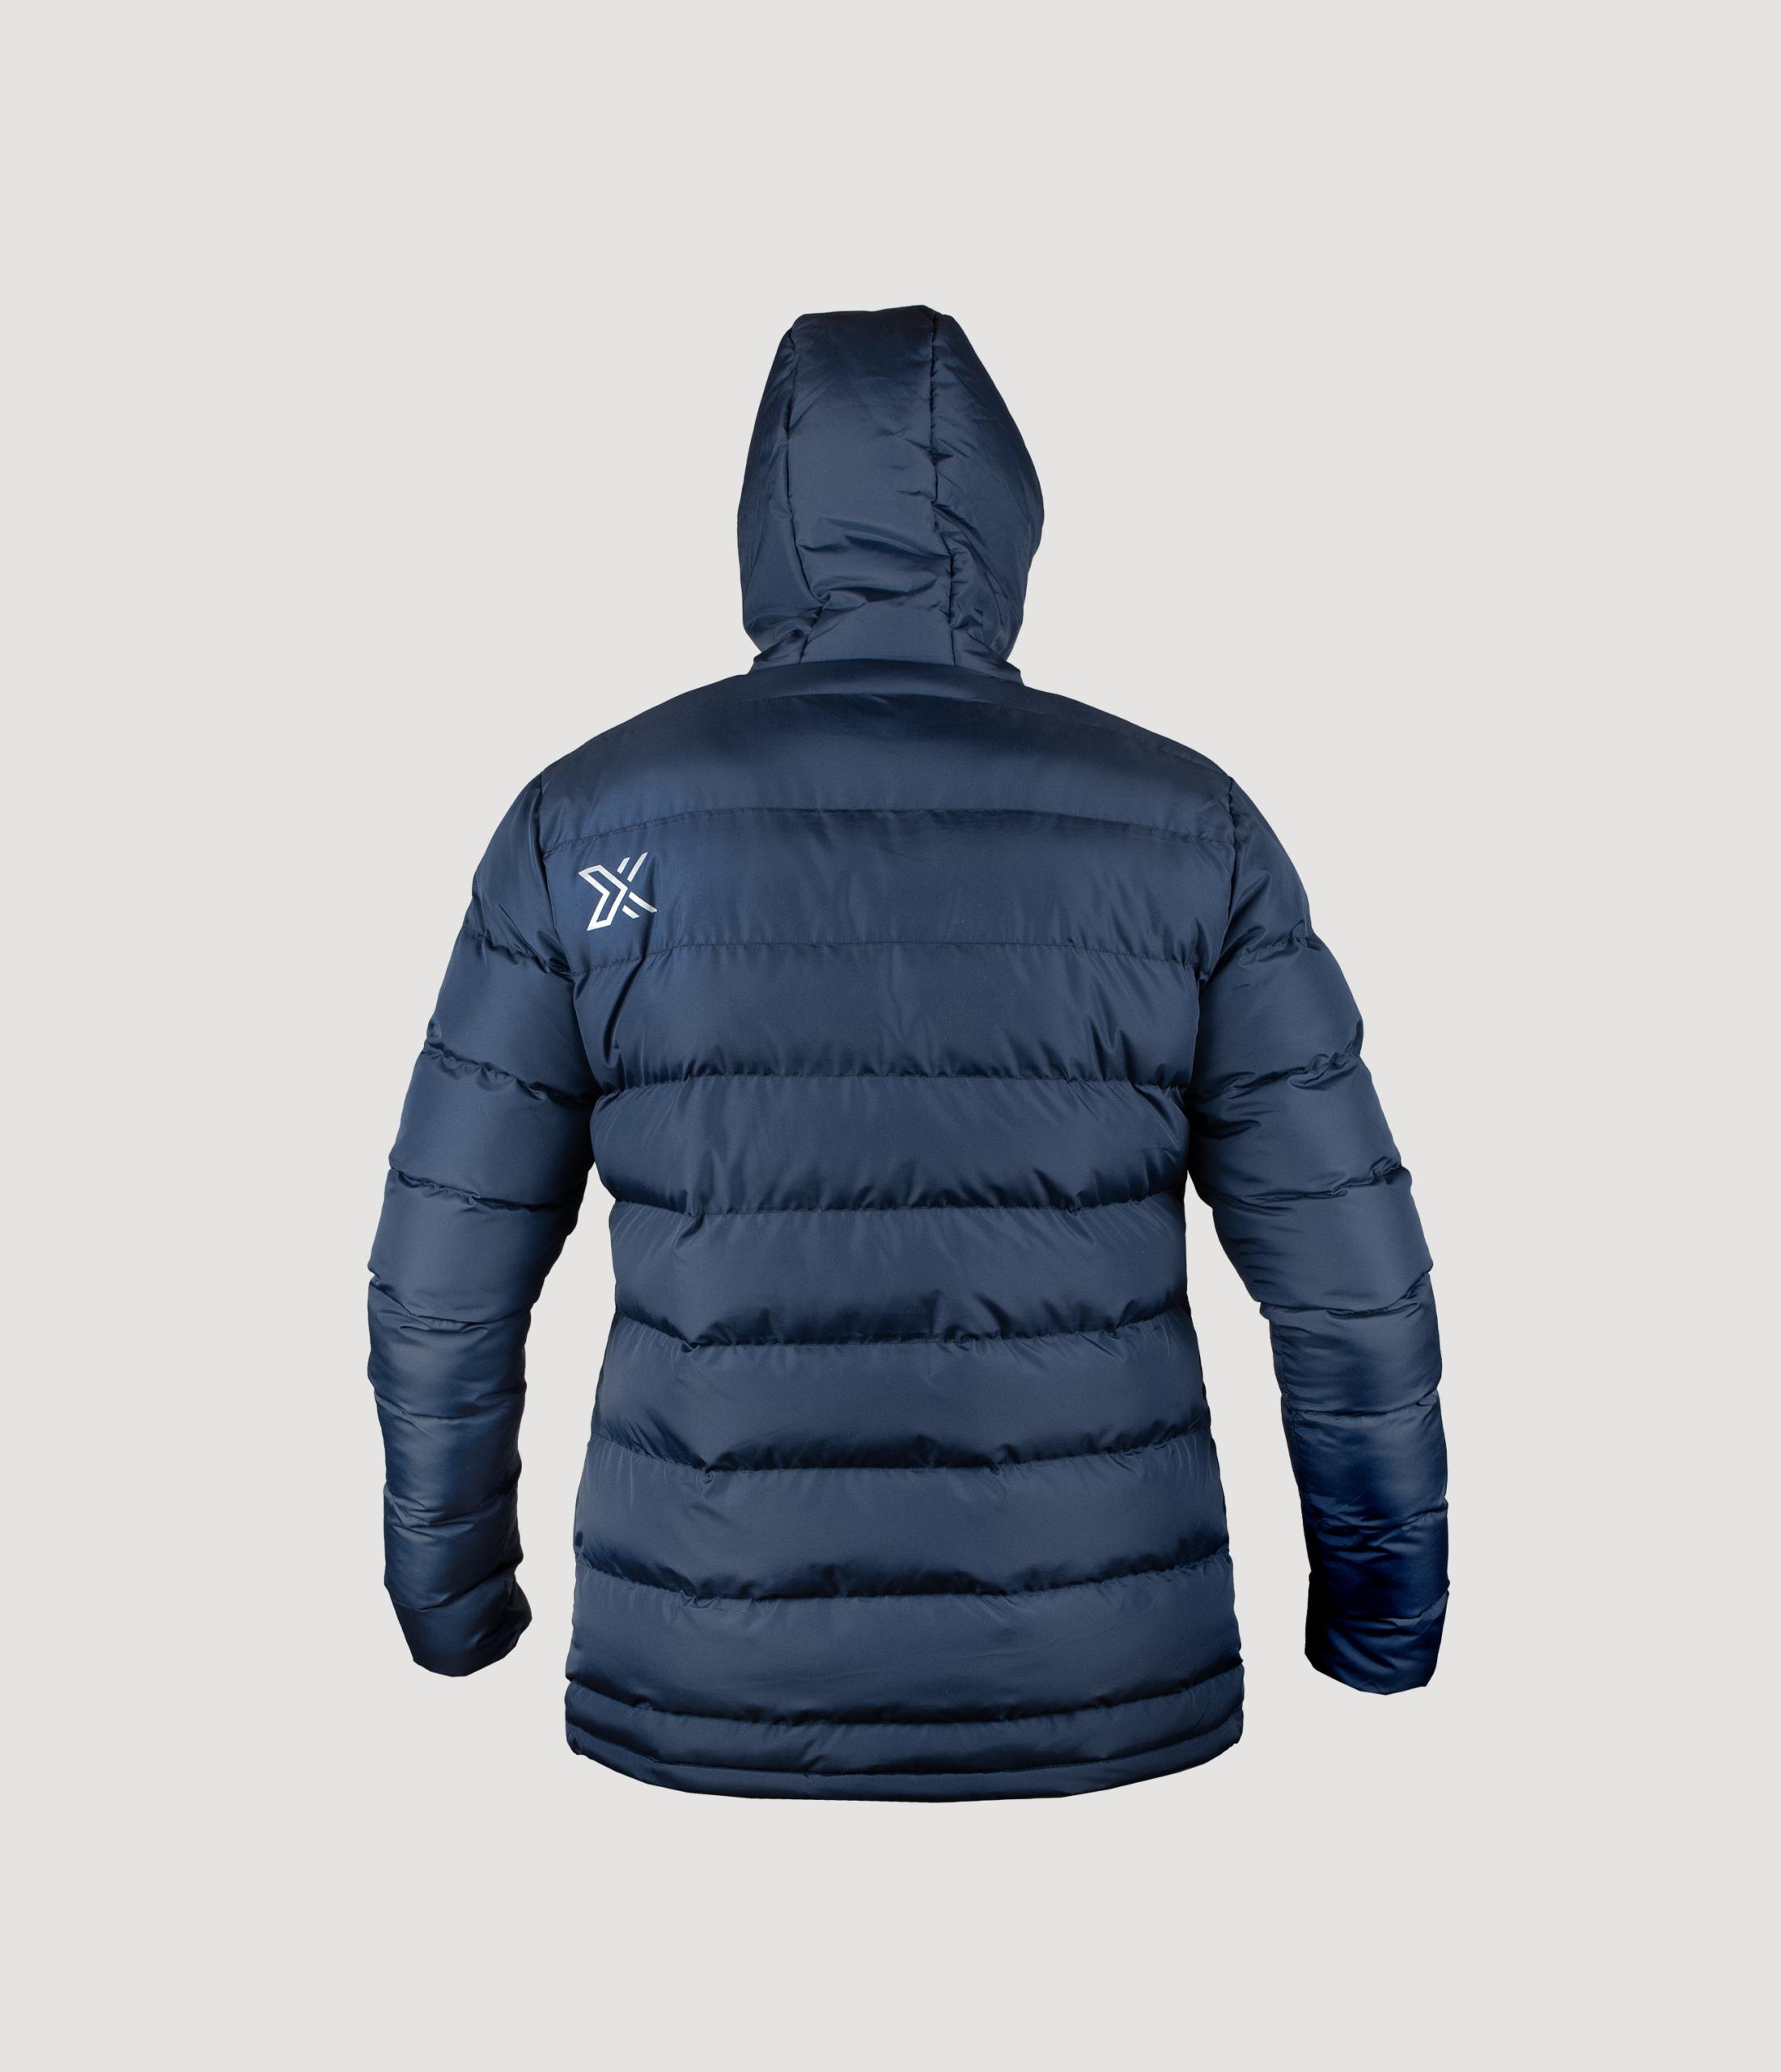 Fenix Padded Jacket Navy Blue